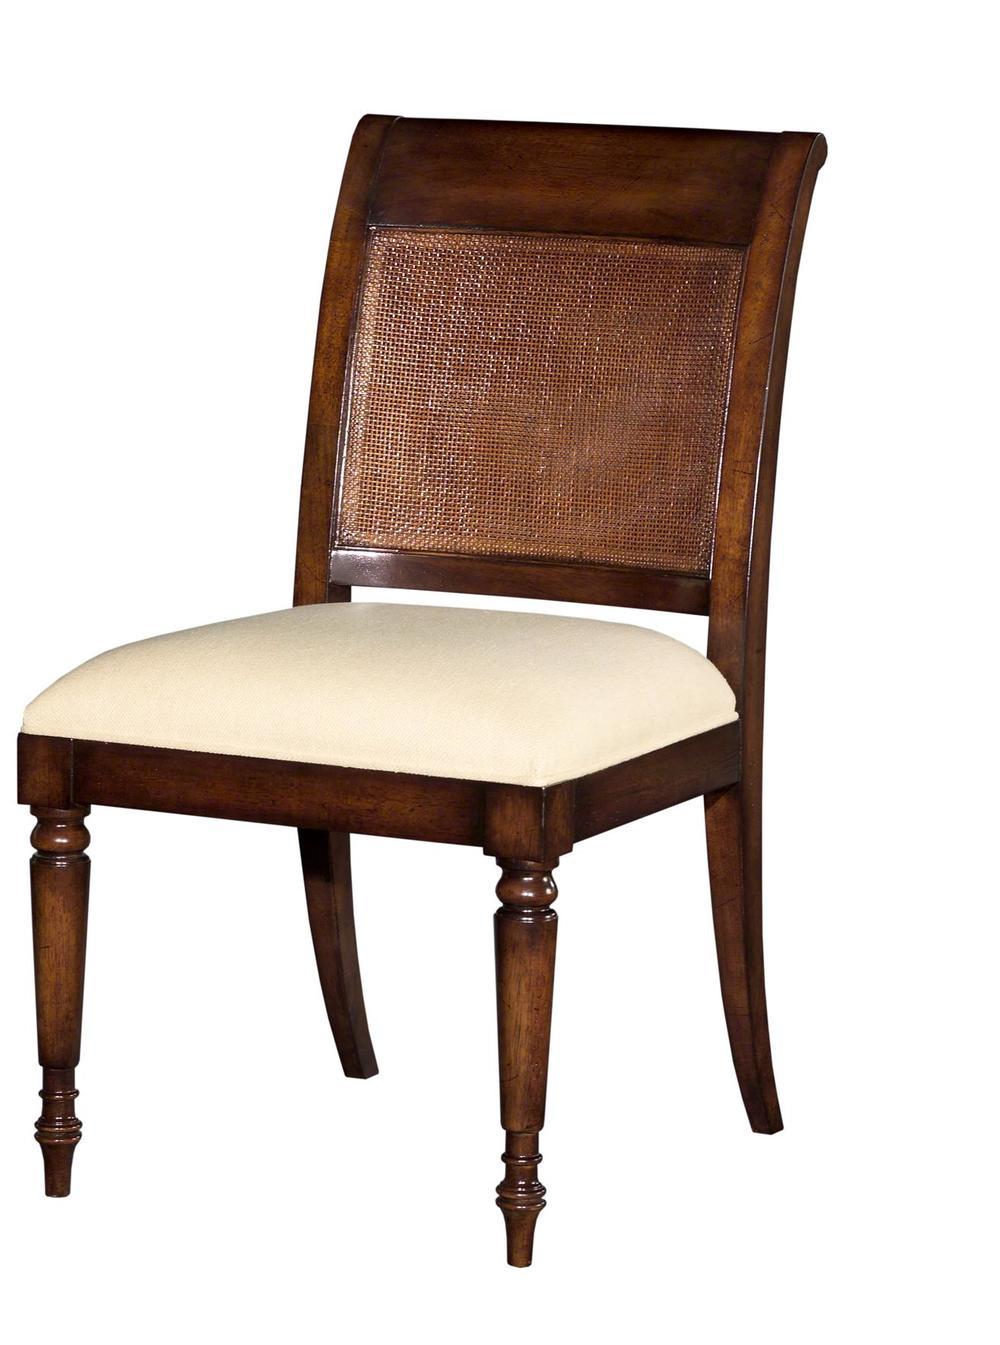 Woodbridge Furniture Company - Hamilton Side Chair